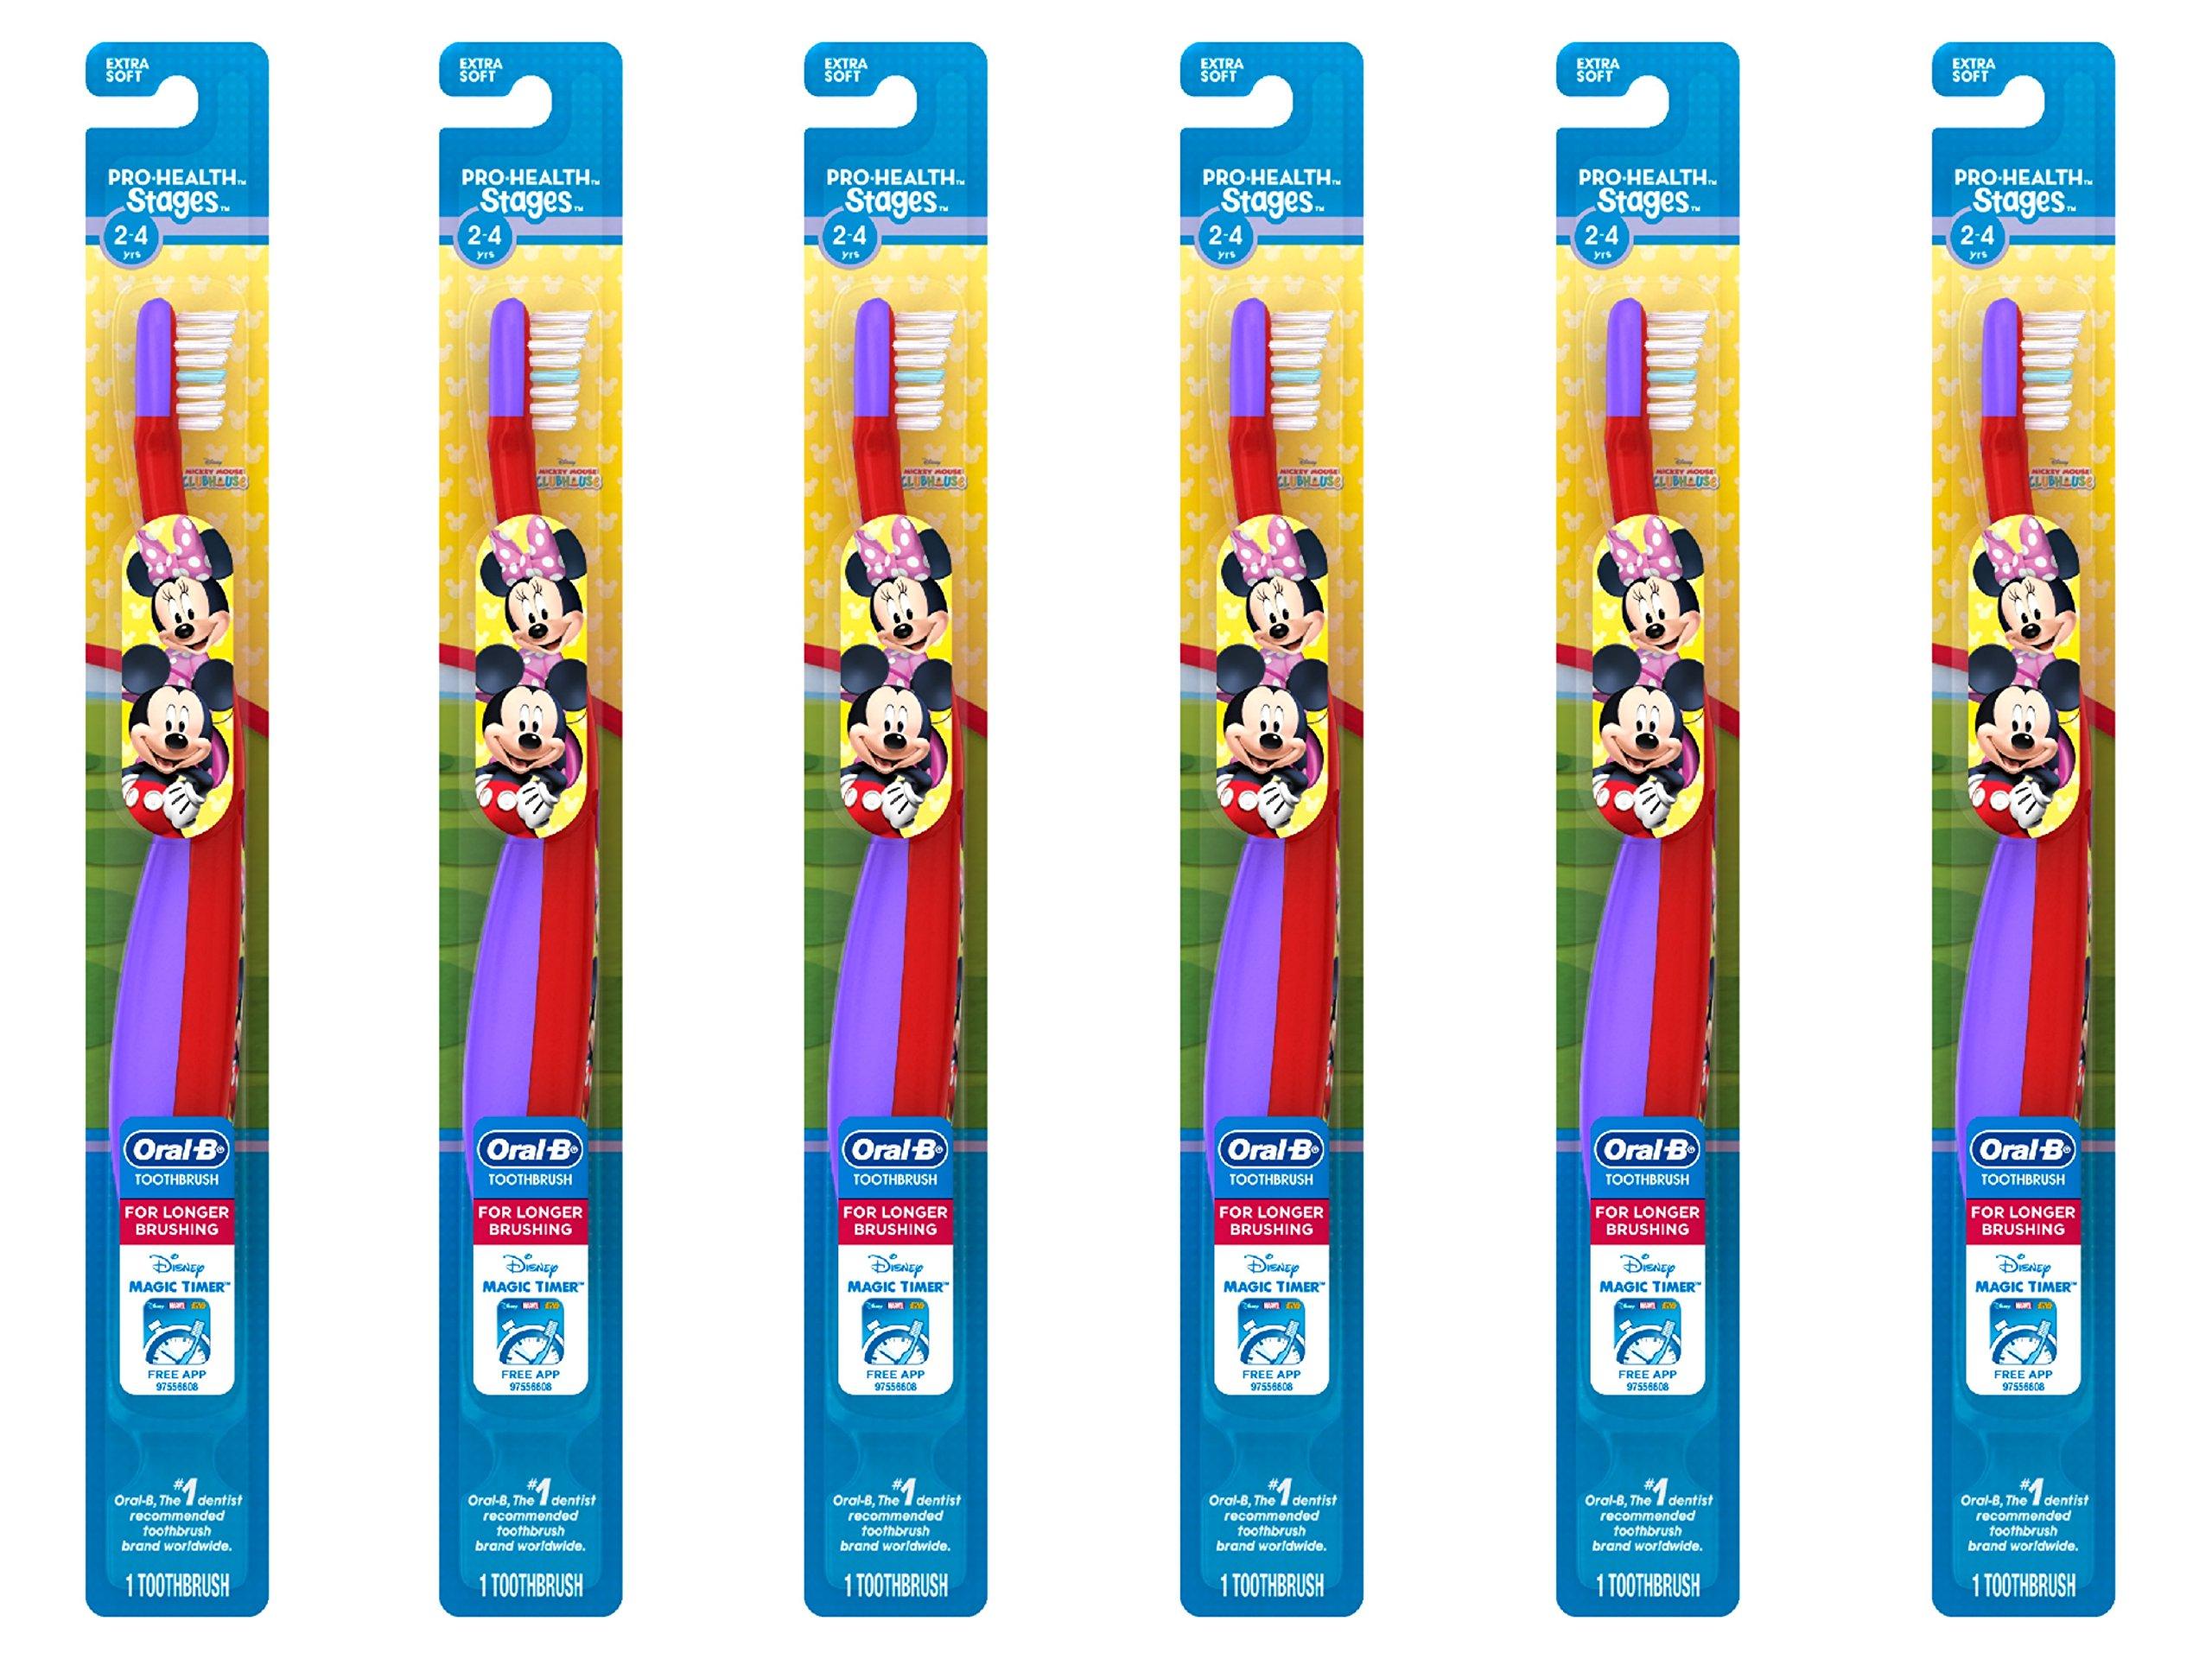 Amazon.com: Crest Pro-Health Stages, Disney Princess